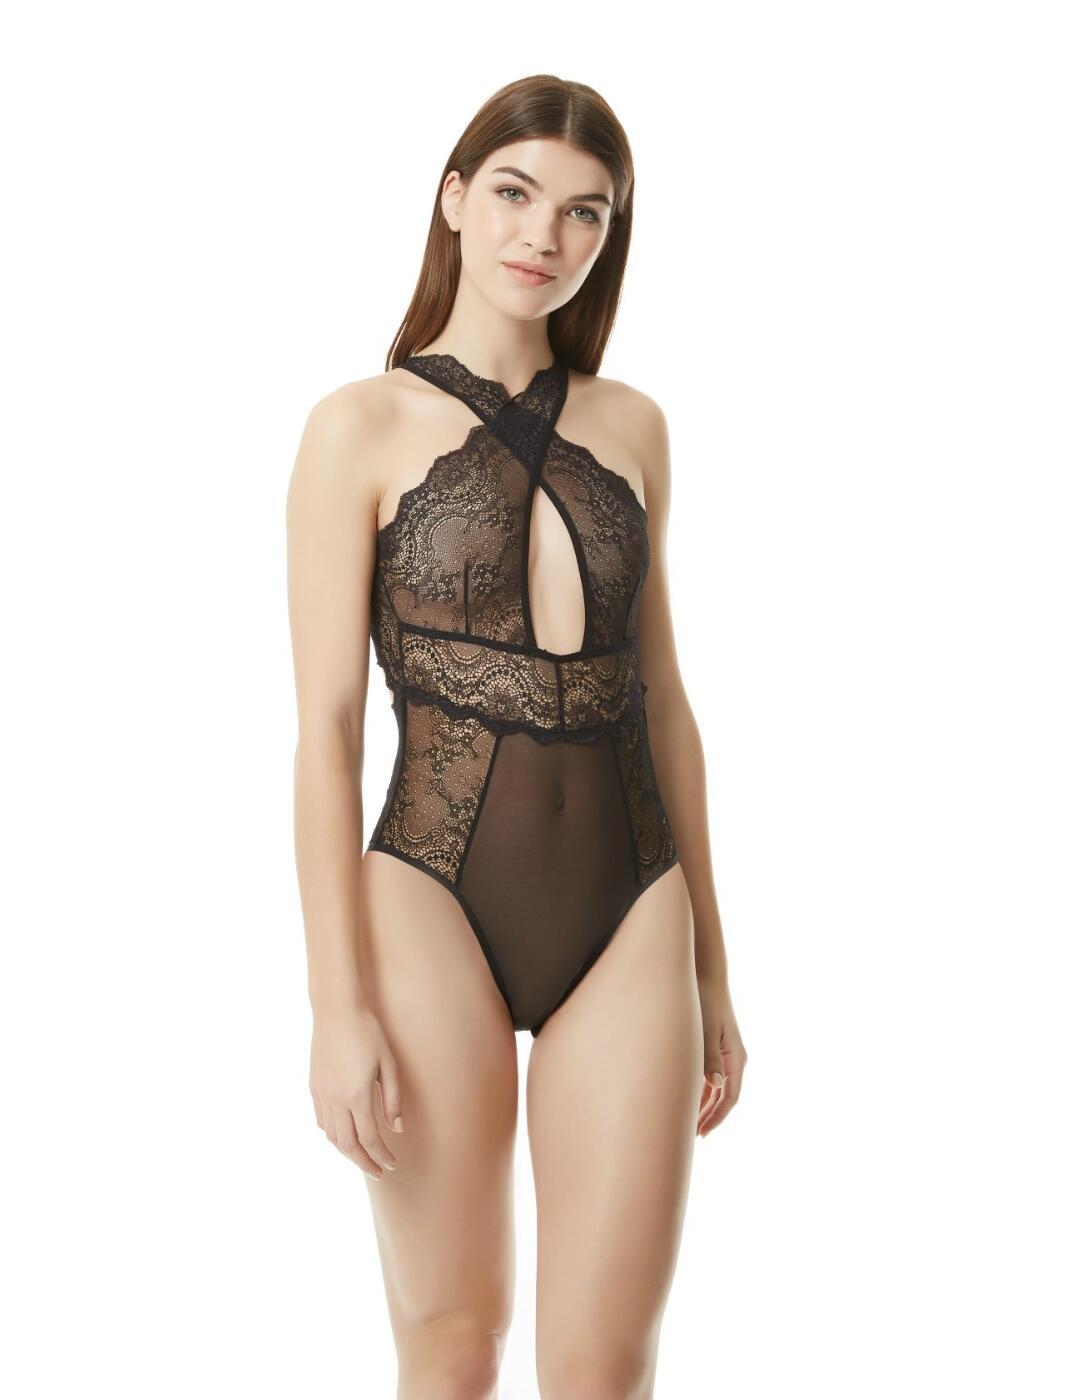 40257 Bluebella Adrienne Body - 40257 Black